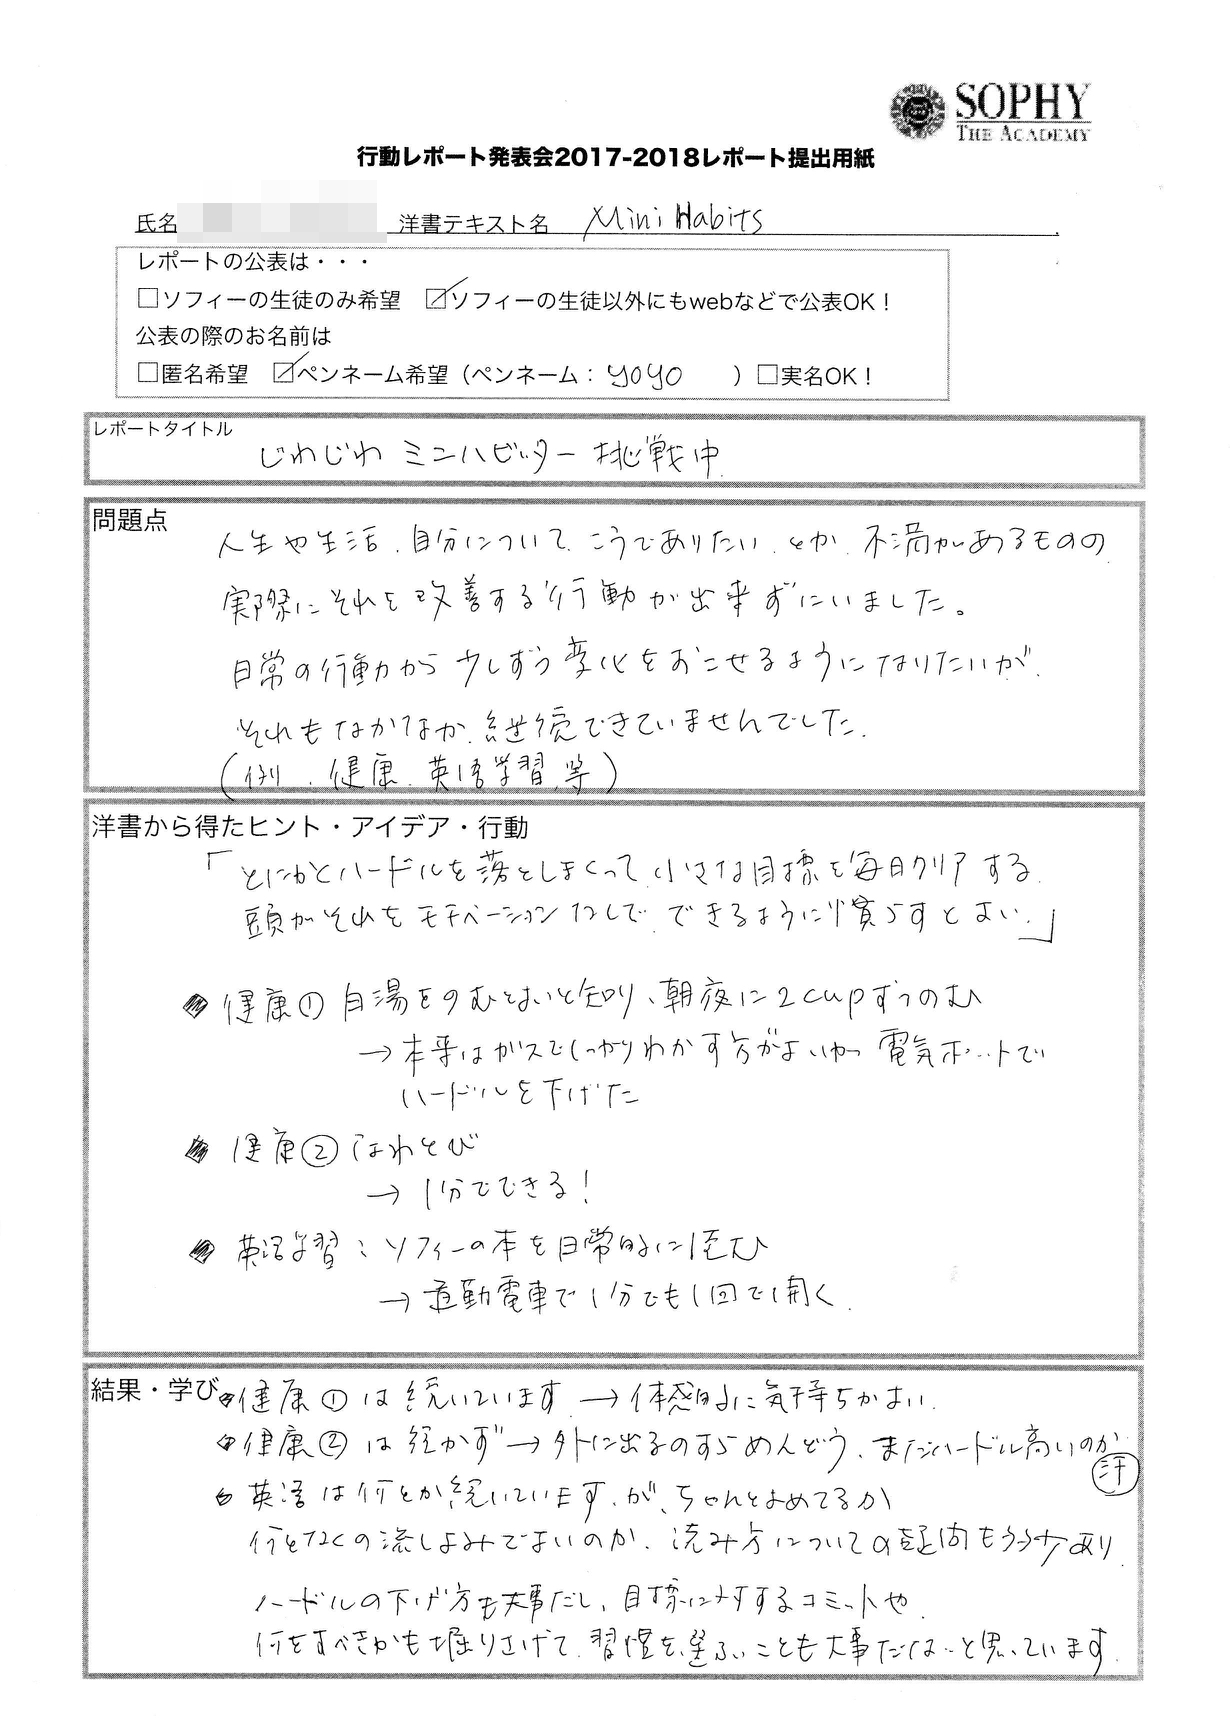 Nakamura Koji